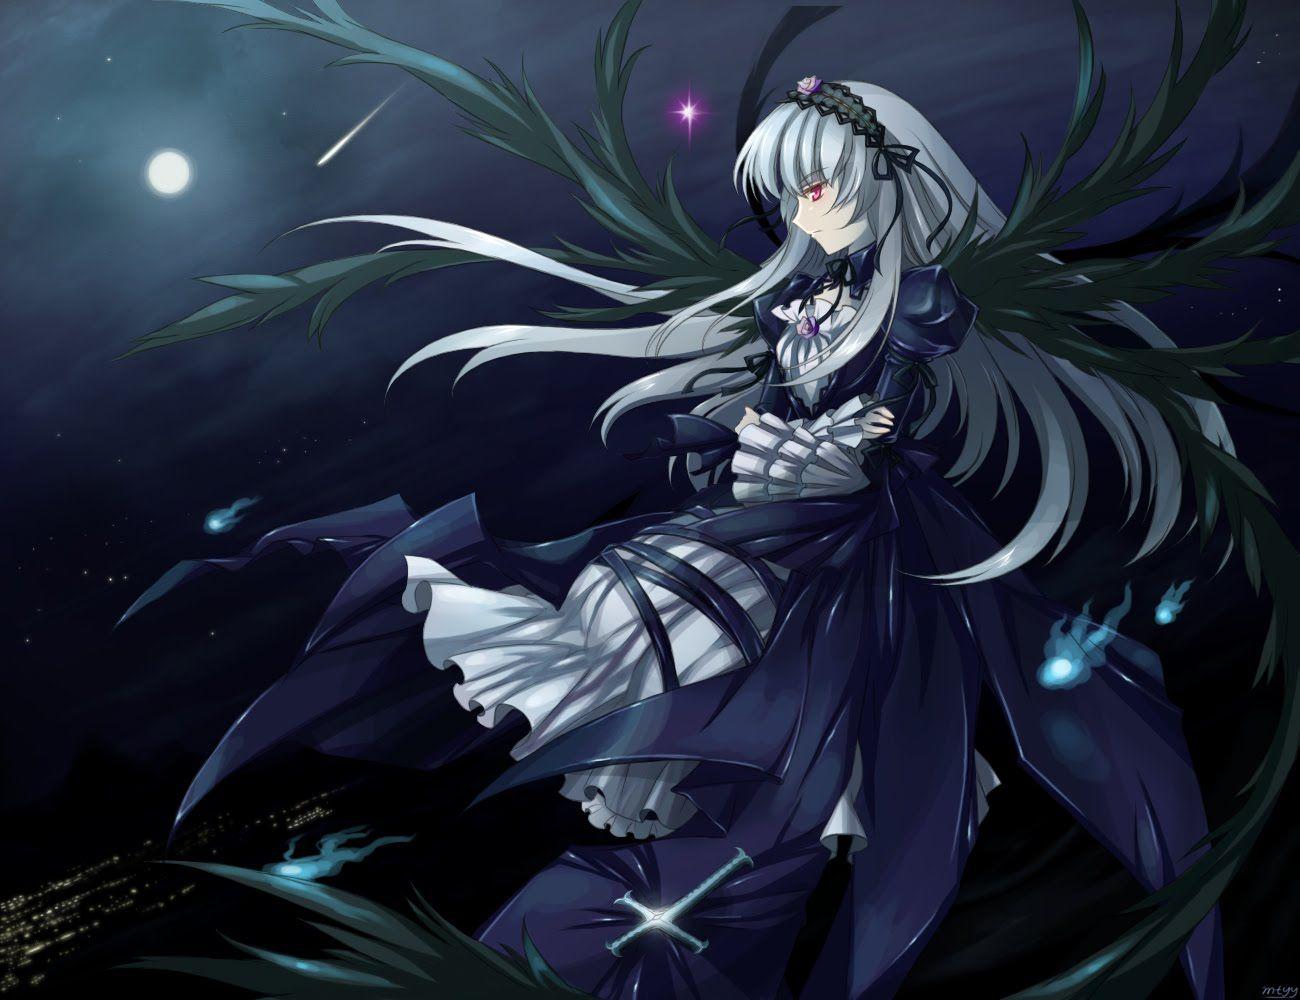 Anime - Rozen Maiden Wallpaper